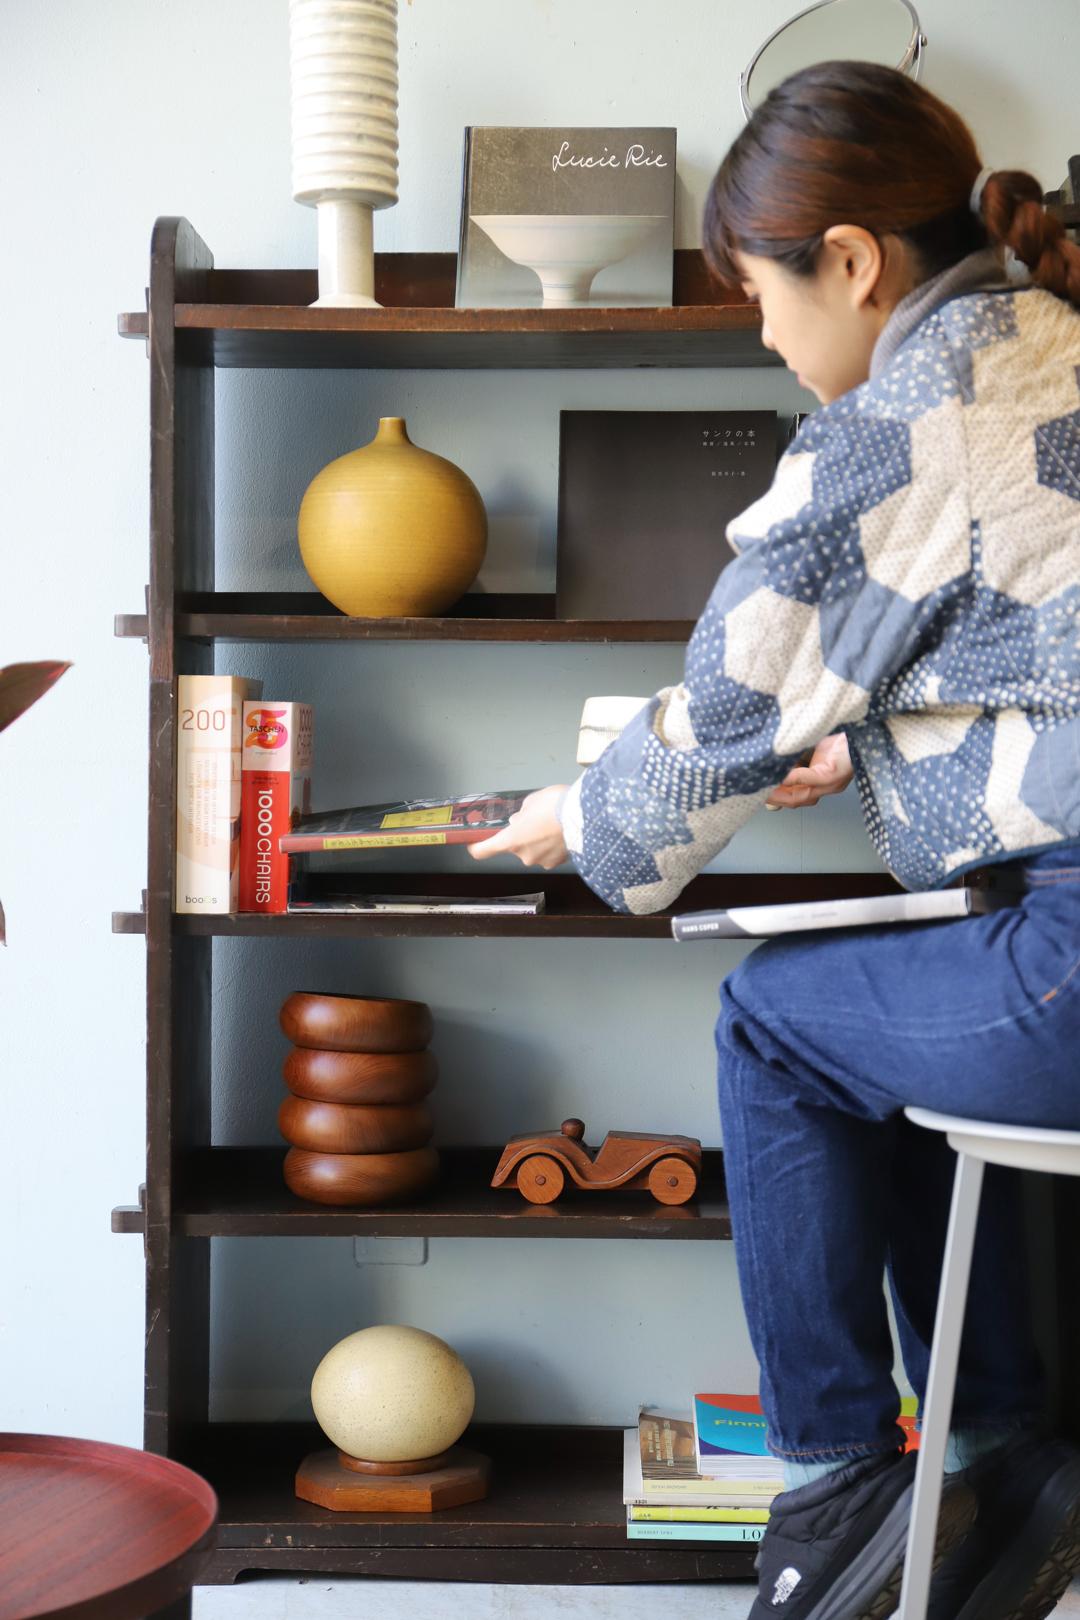 Japanese Vintage Wedge Book Shelf/ジャパンヴィンテージ 本棚 ブックシェルフ 楔式 収納 古道具 昭和レトロ